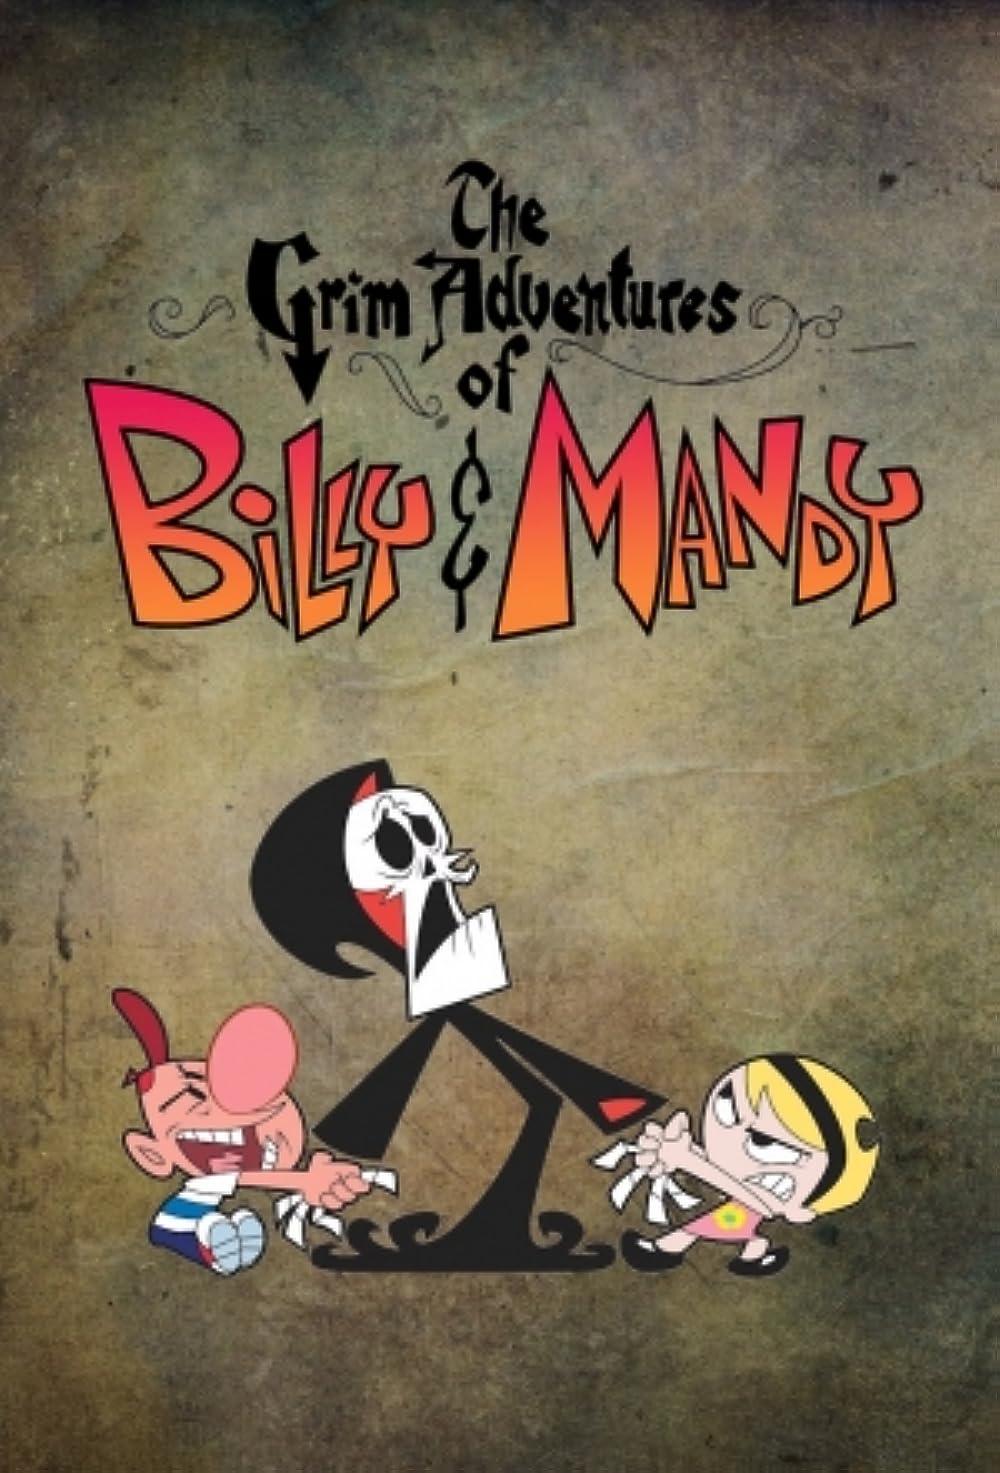 Billy & Mandy IMDb Amazon Image